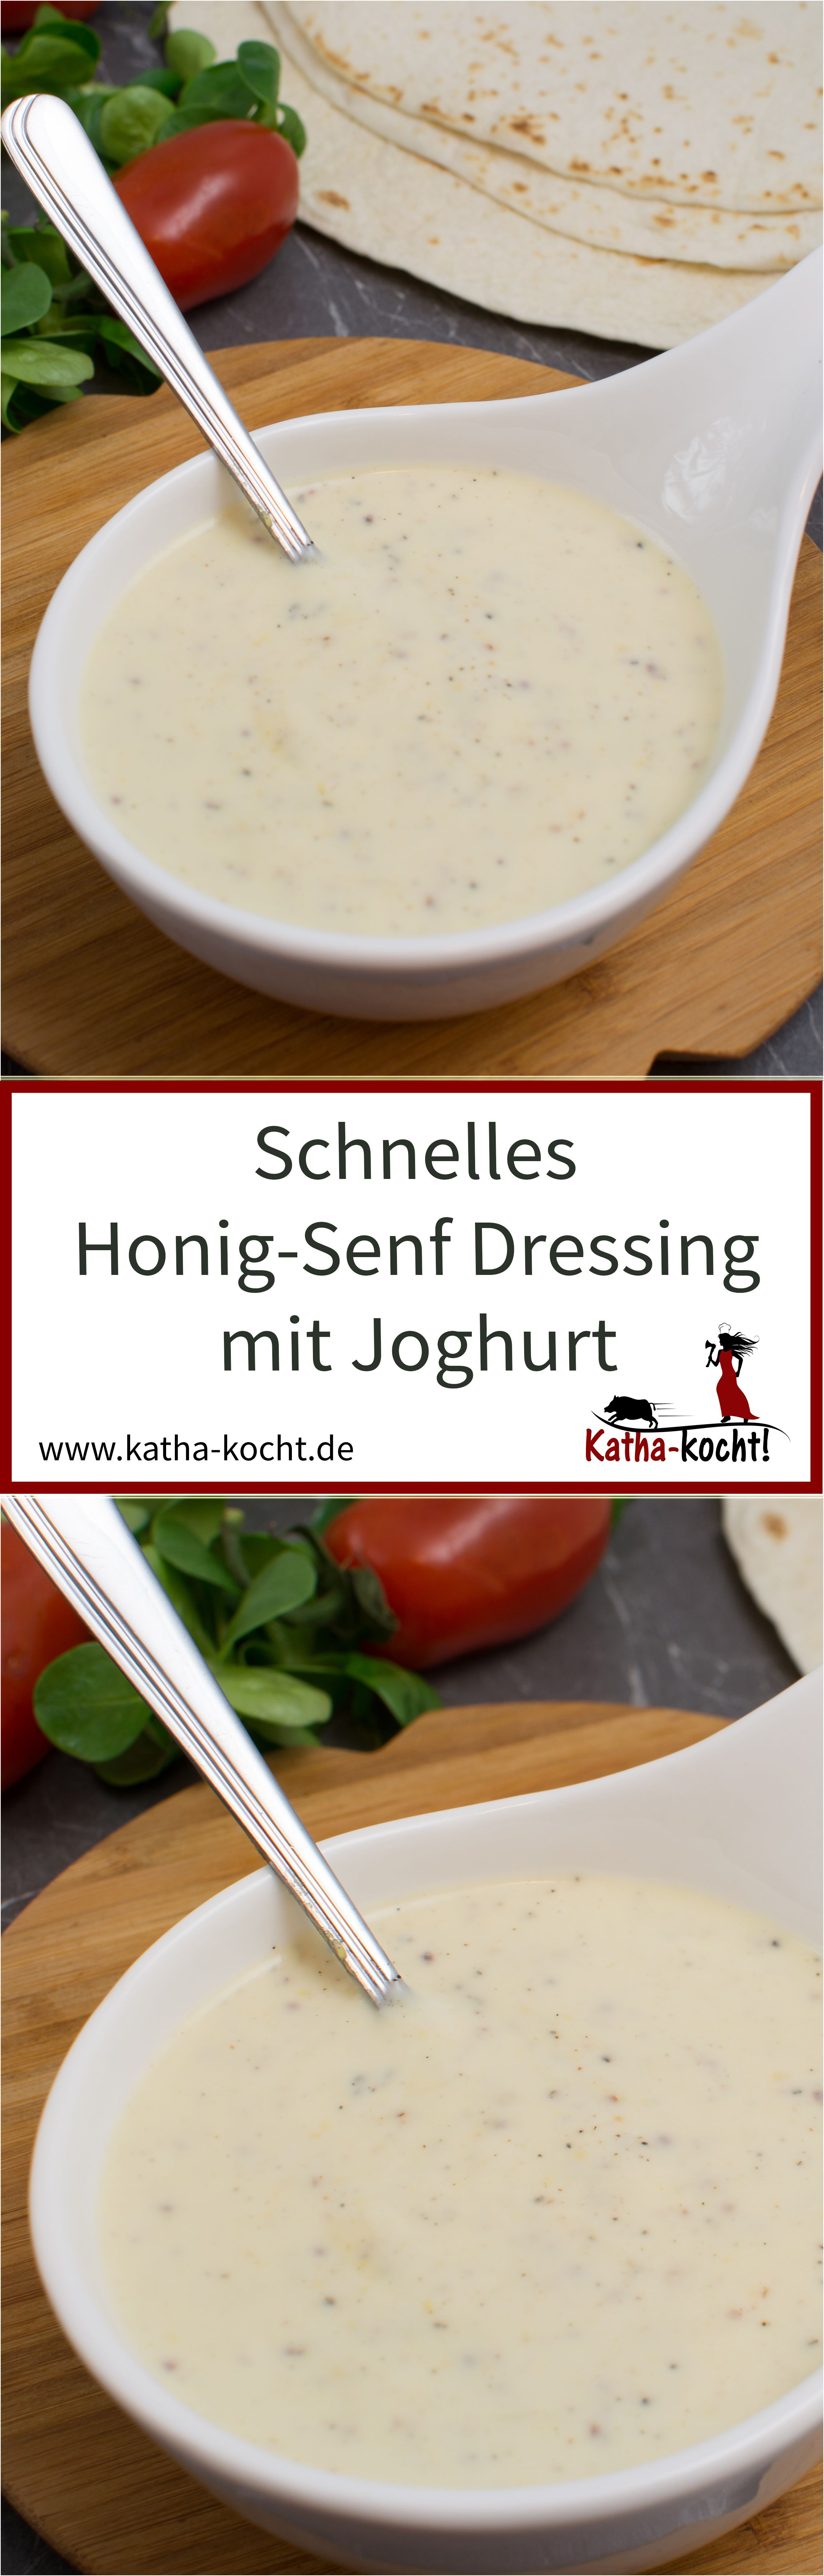 Honig-Senf Dressing mit Joghurt #marinadesauce